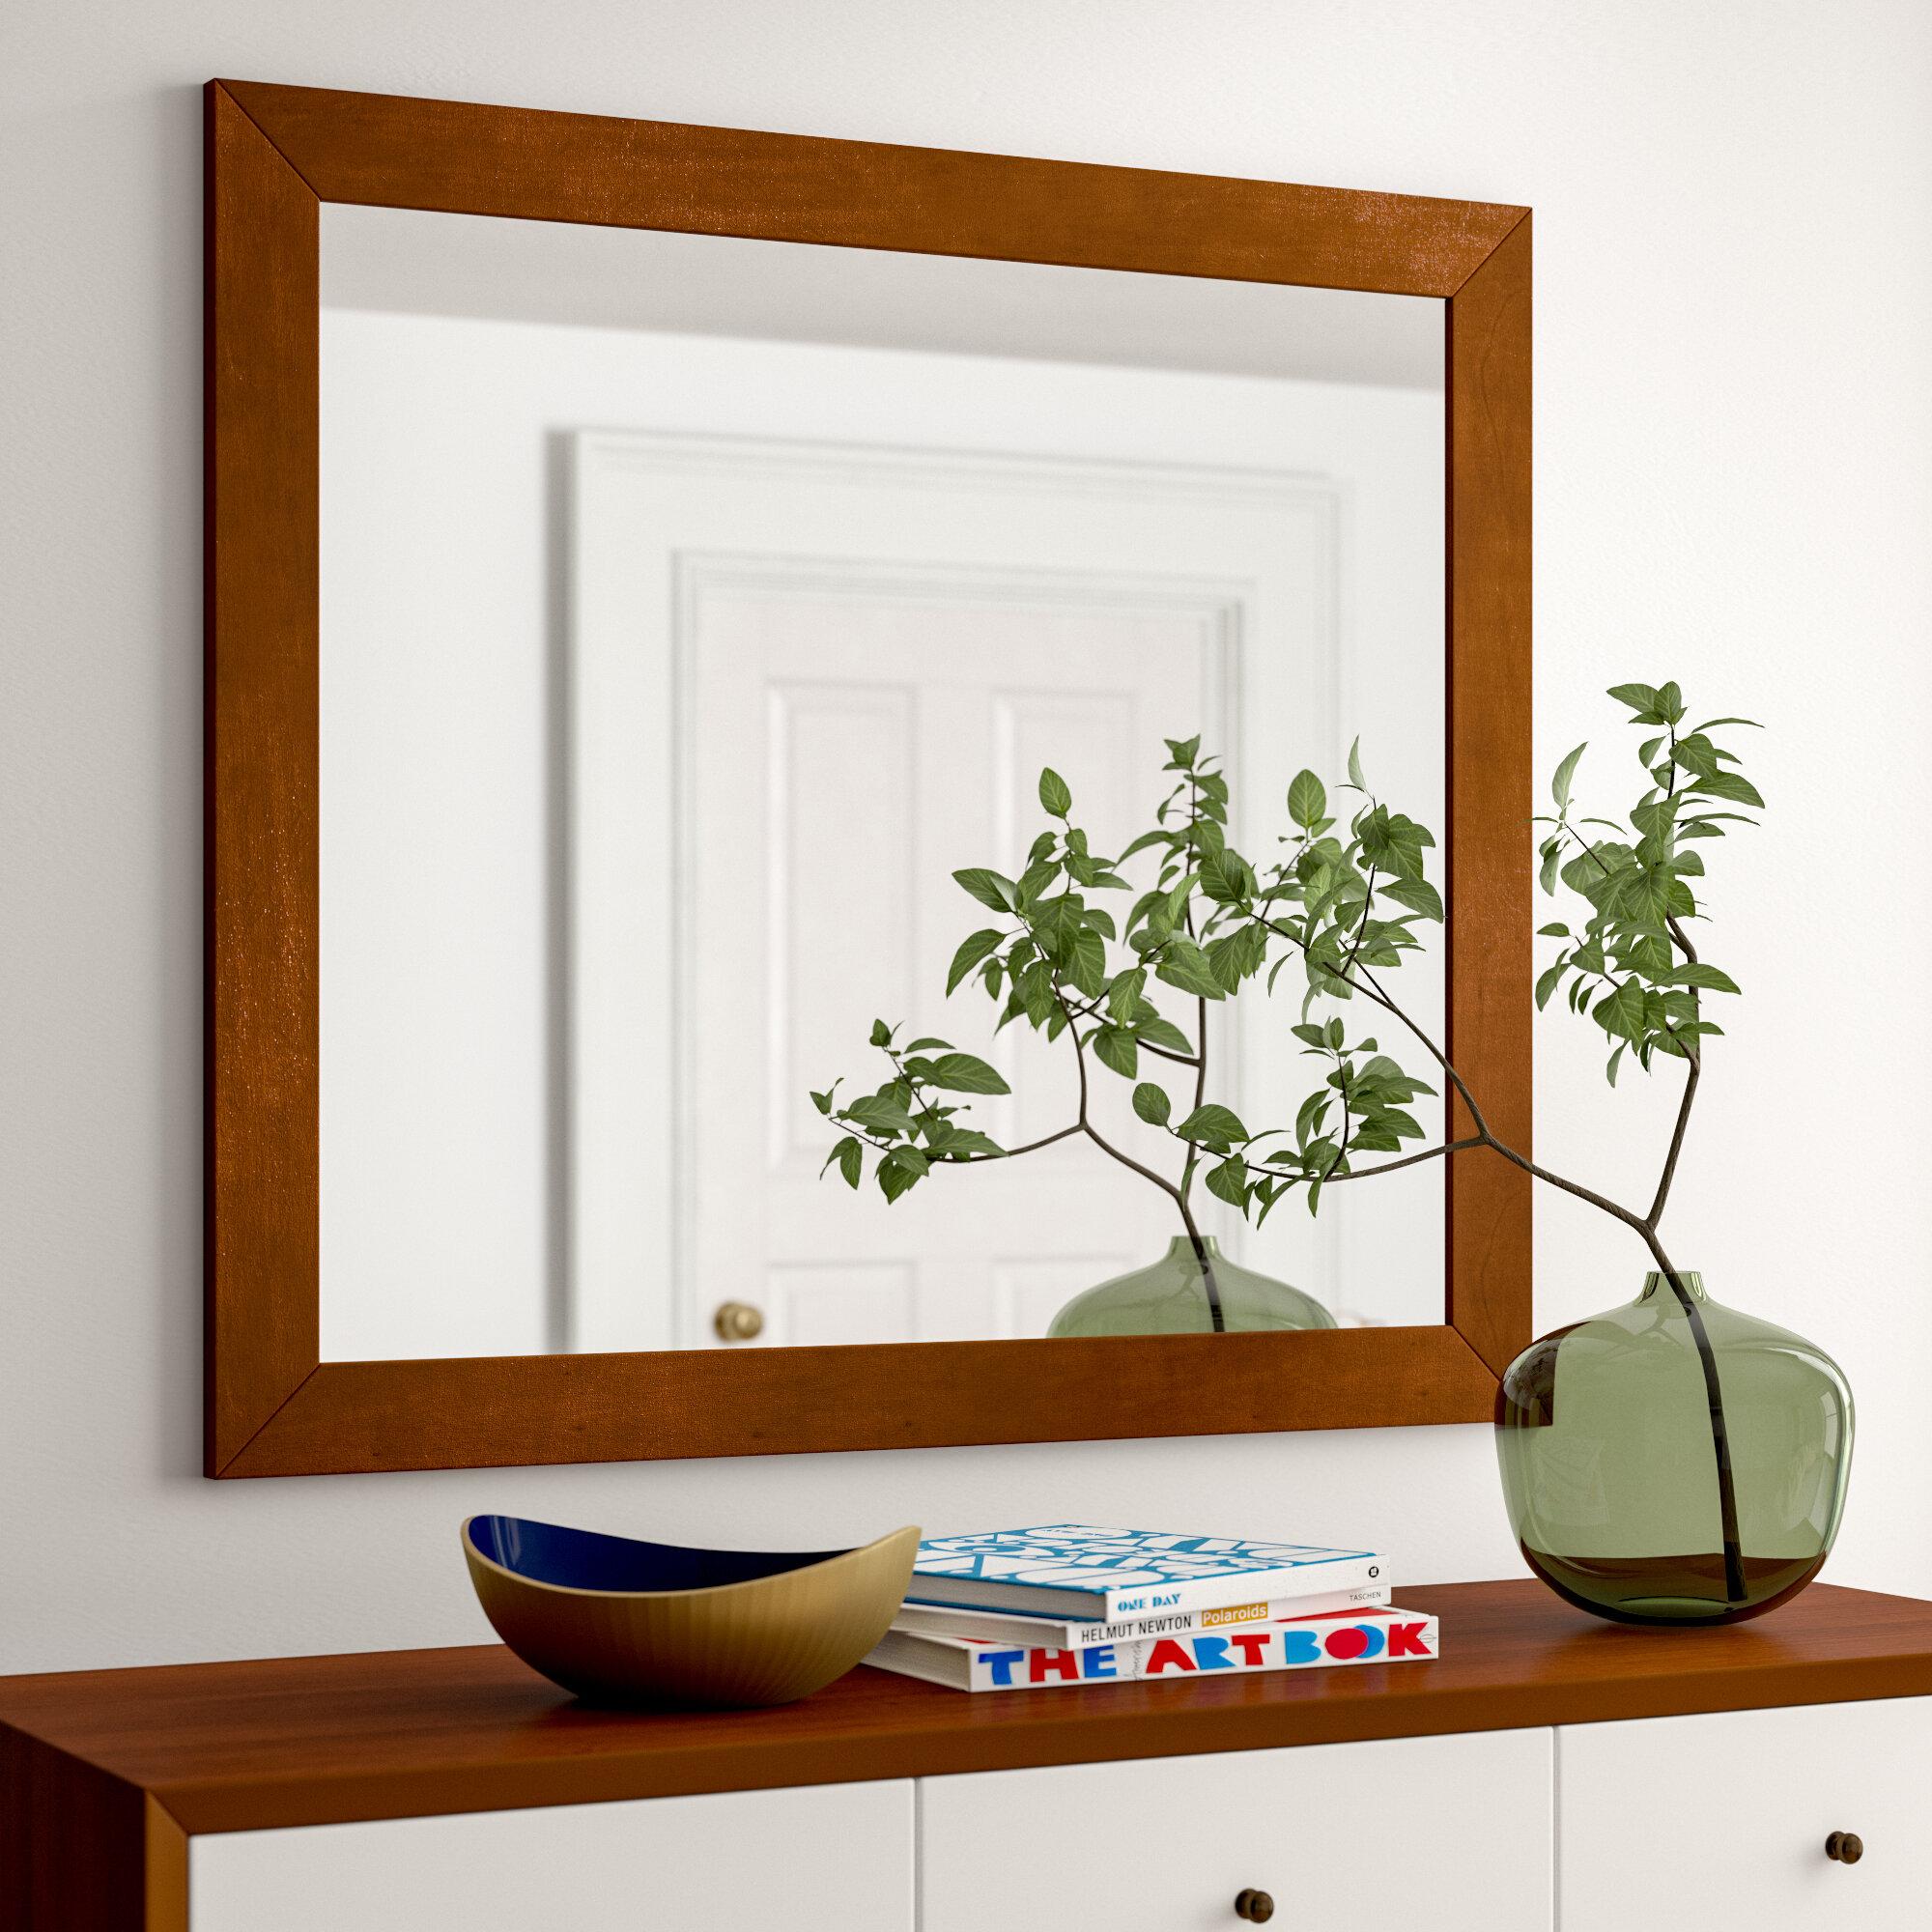 Image of: Foundstone Parocela Mid Century Modern Dresser Mirror Wayfair Ca